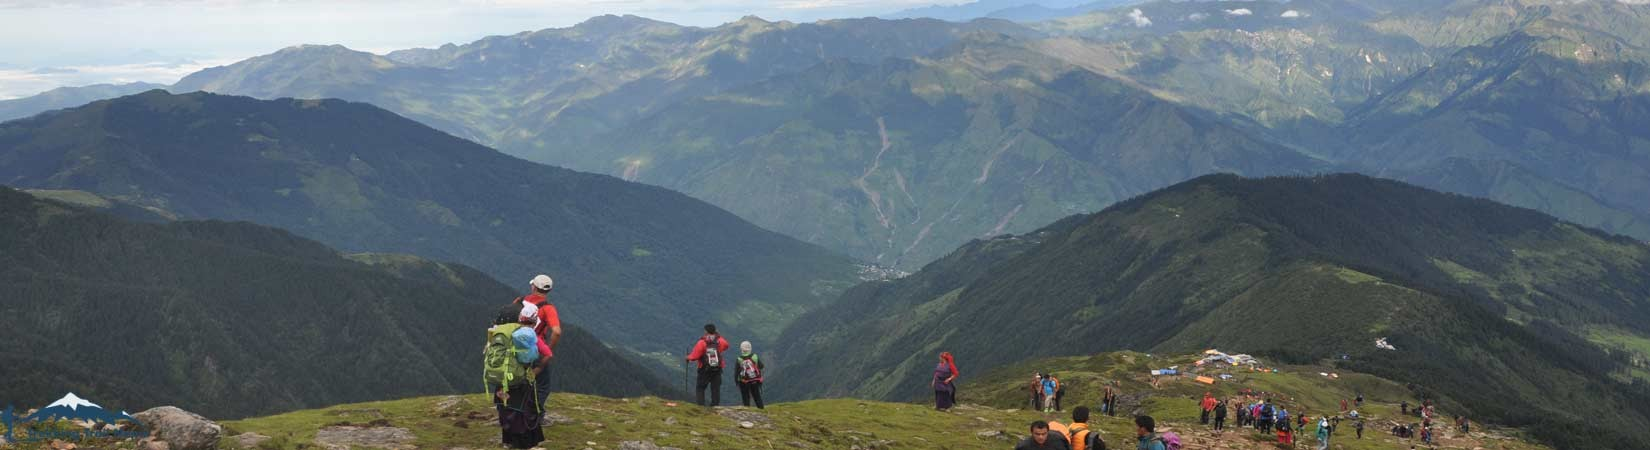 Langtang Valley Gosainkunda Lake Trek